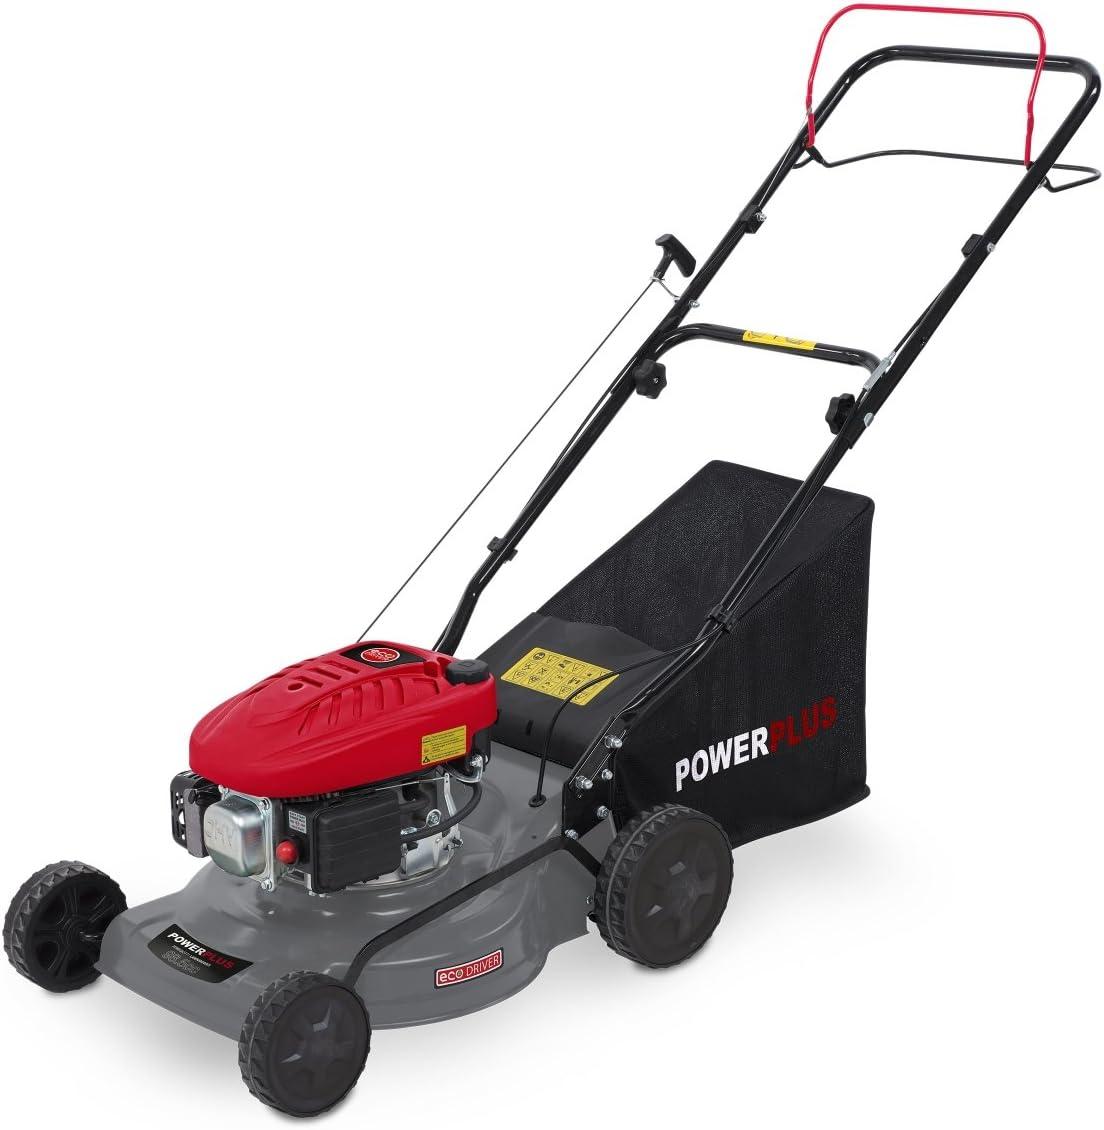 Powerplus POWEG63772 Walk behind lawn mower Gasolina Negro, Gris, Rojo cortadora de césped - Cortacésped (Walk behind lawn mower, 41 cm, 2,5 cm, 7,5 cm, Cuchillas giratorias, 0,8 L)